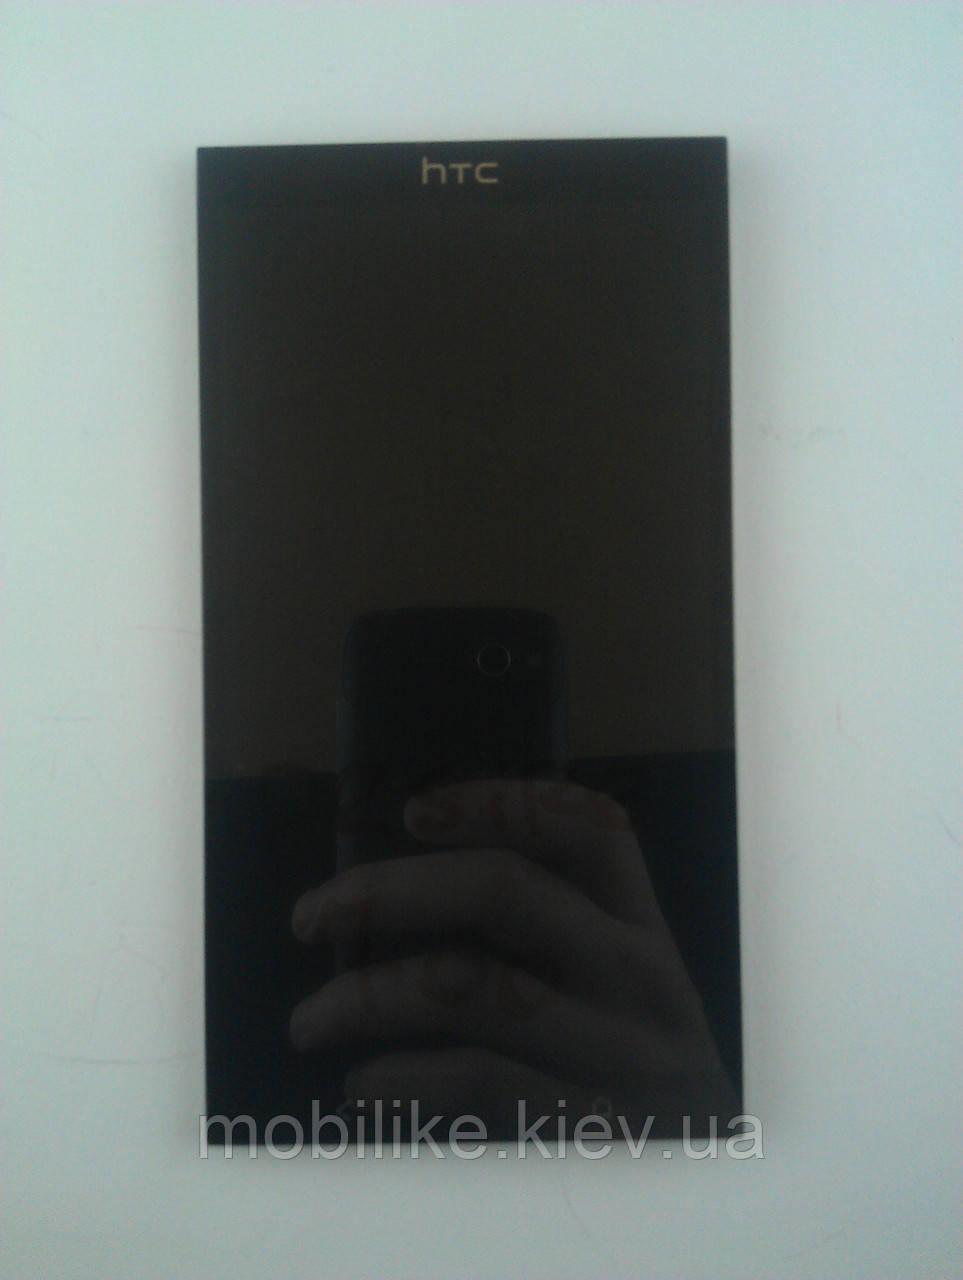 Дисплей з сенсорним екраном HTC Desire 700 чорний